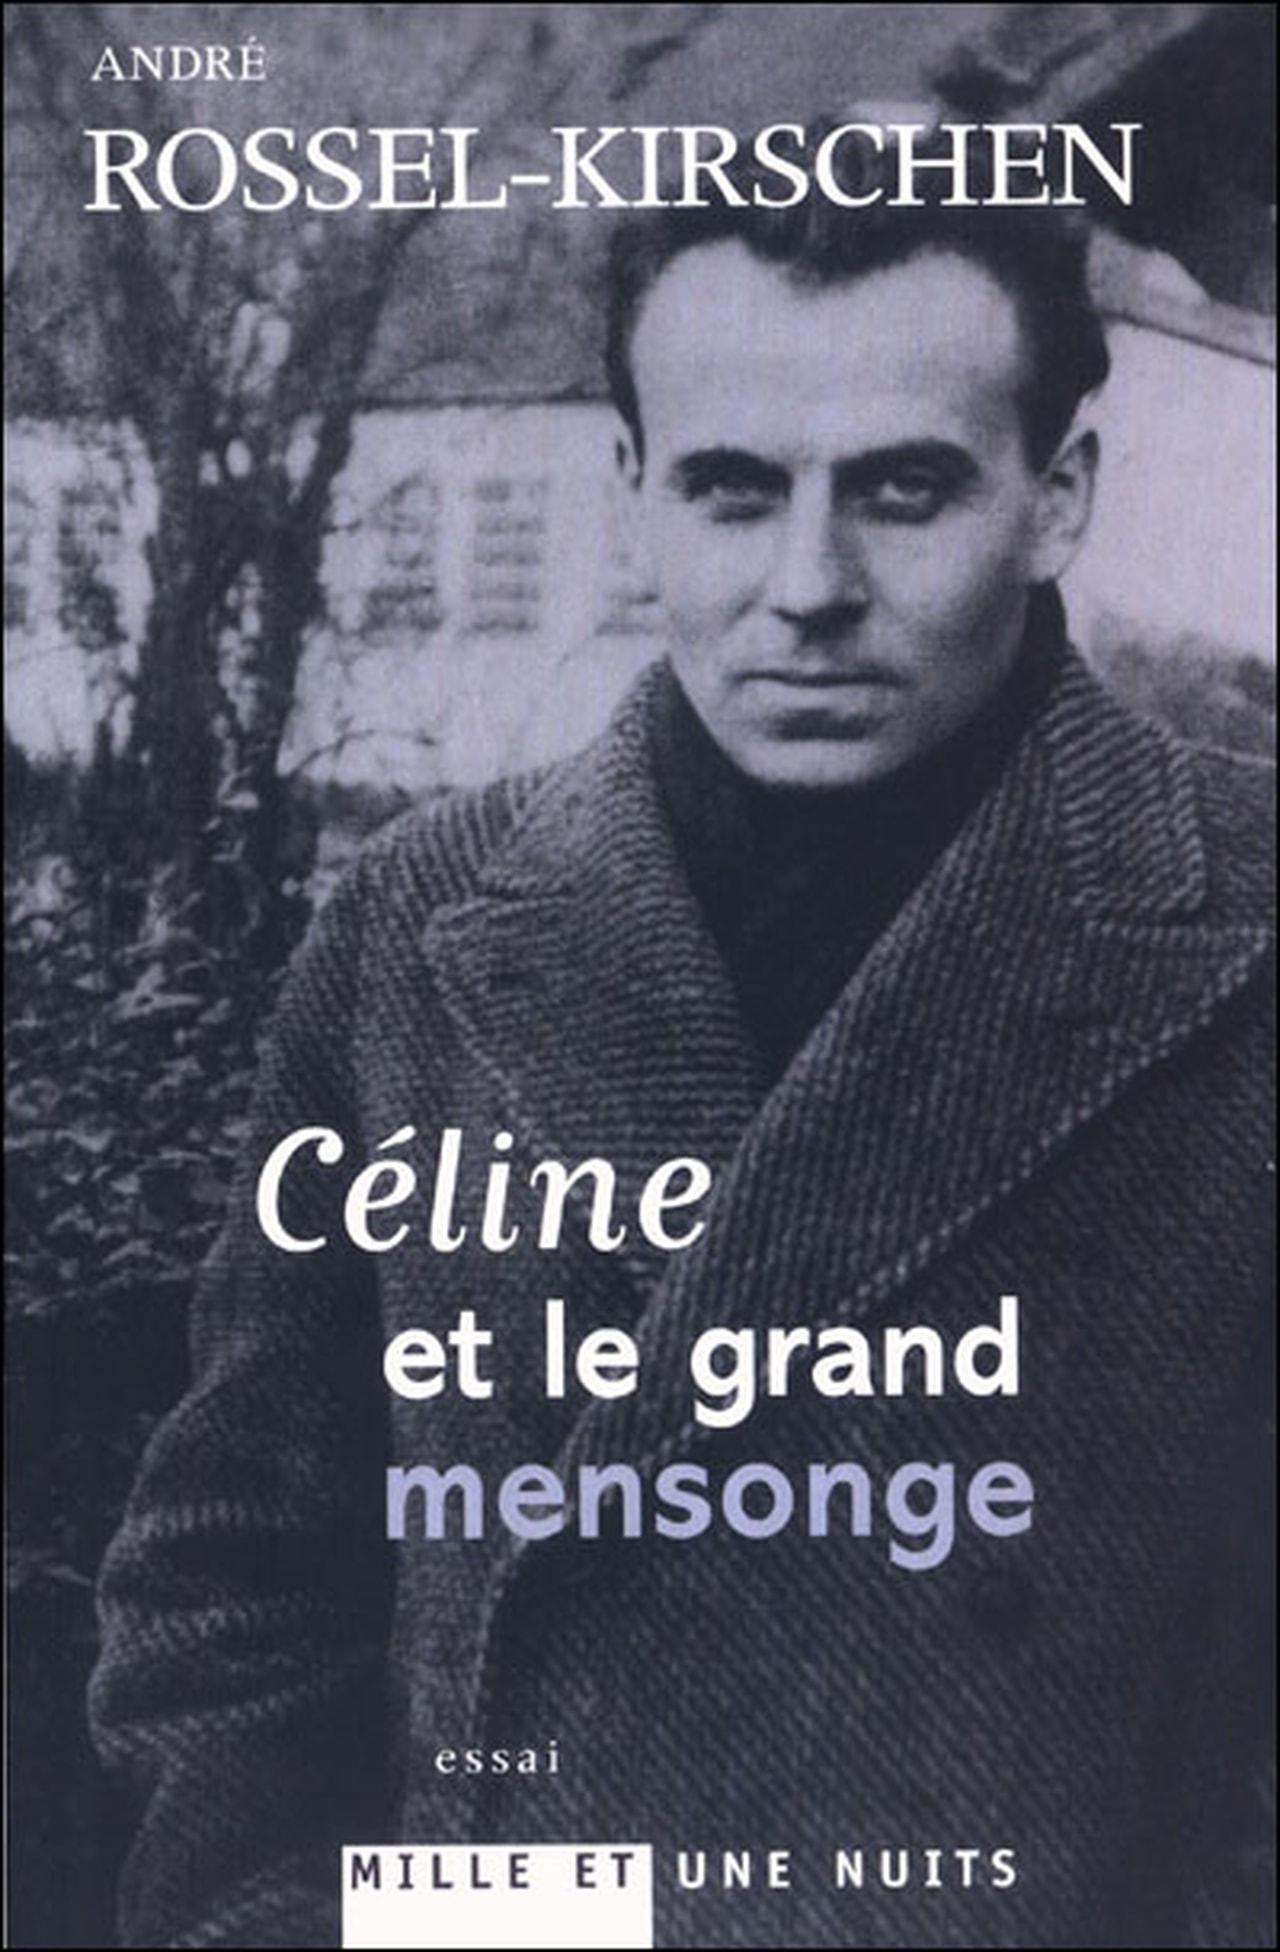 CELINE LE GRAND MENSONGE